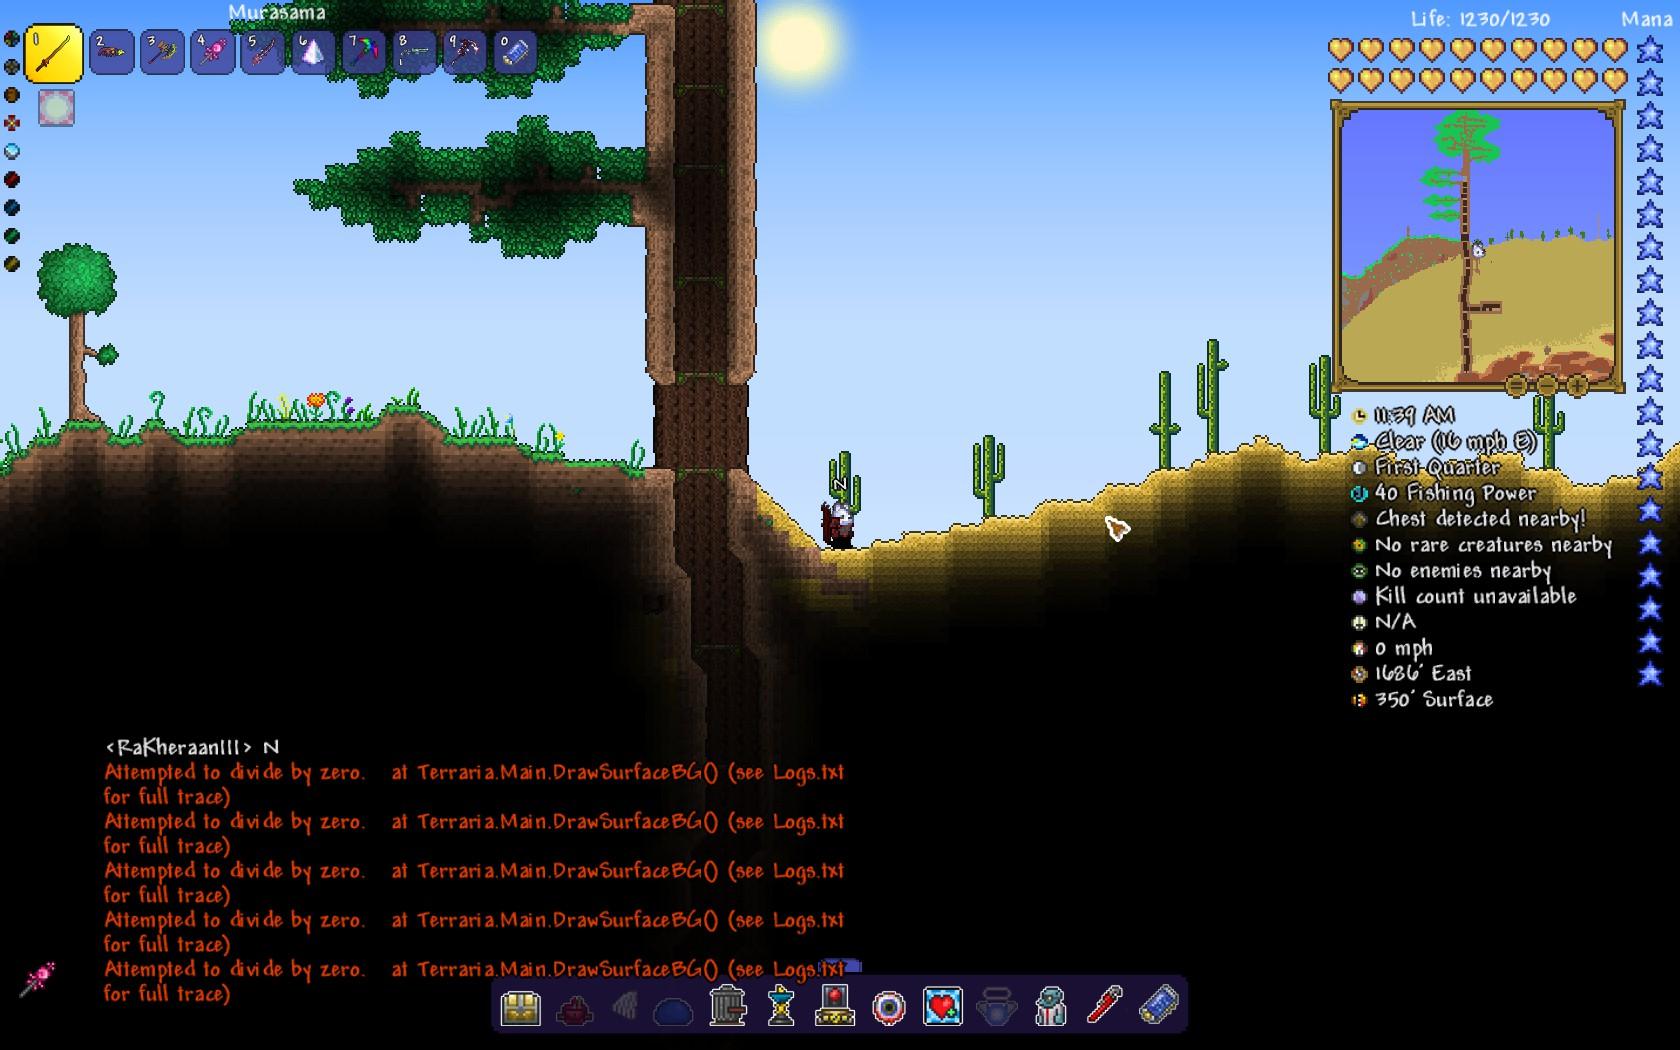 tModLoader - Terraria Overhaul - Gameplay enhancements and